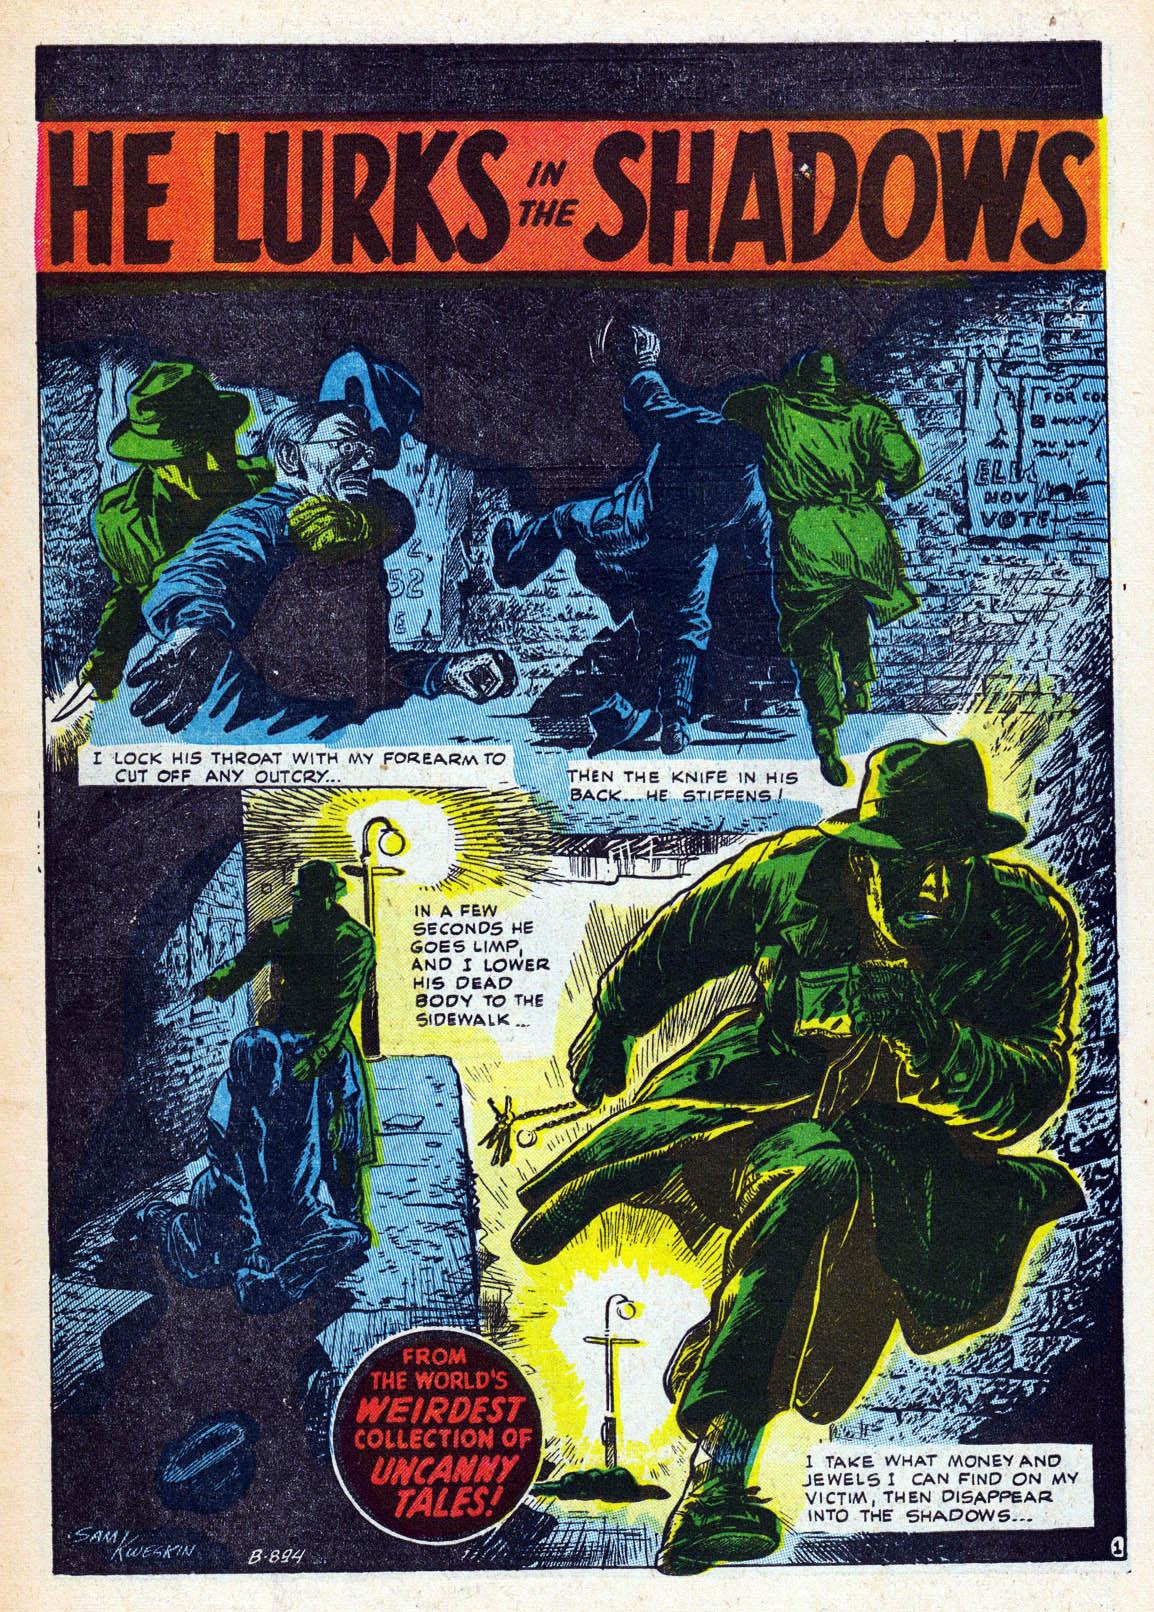 LurksInShadows1